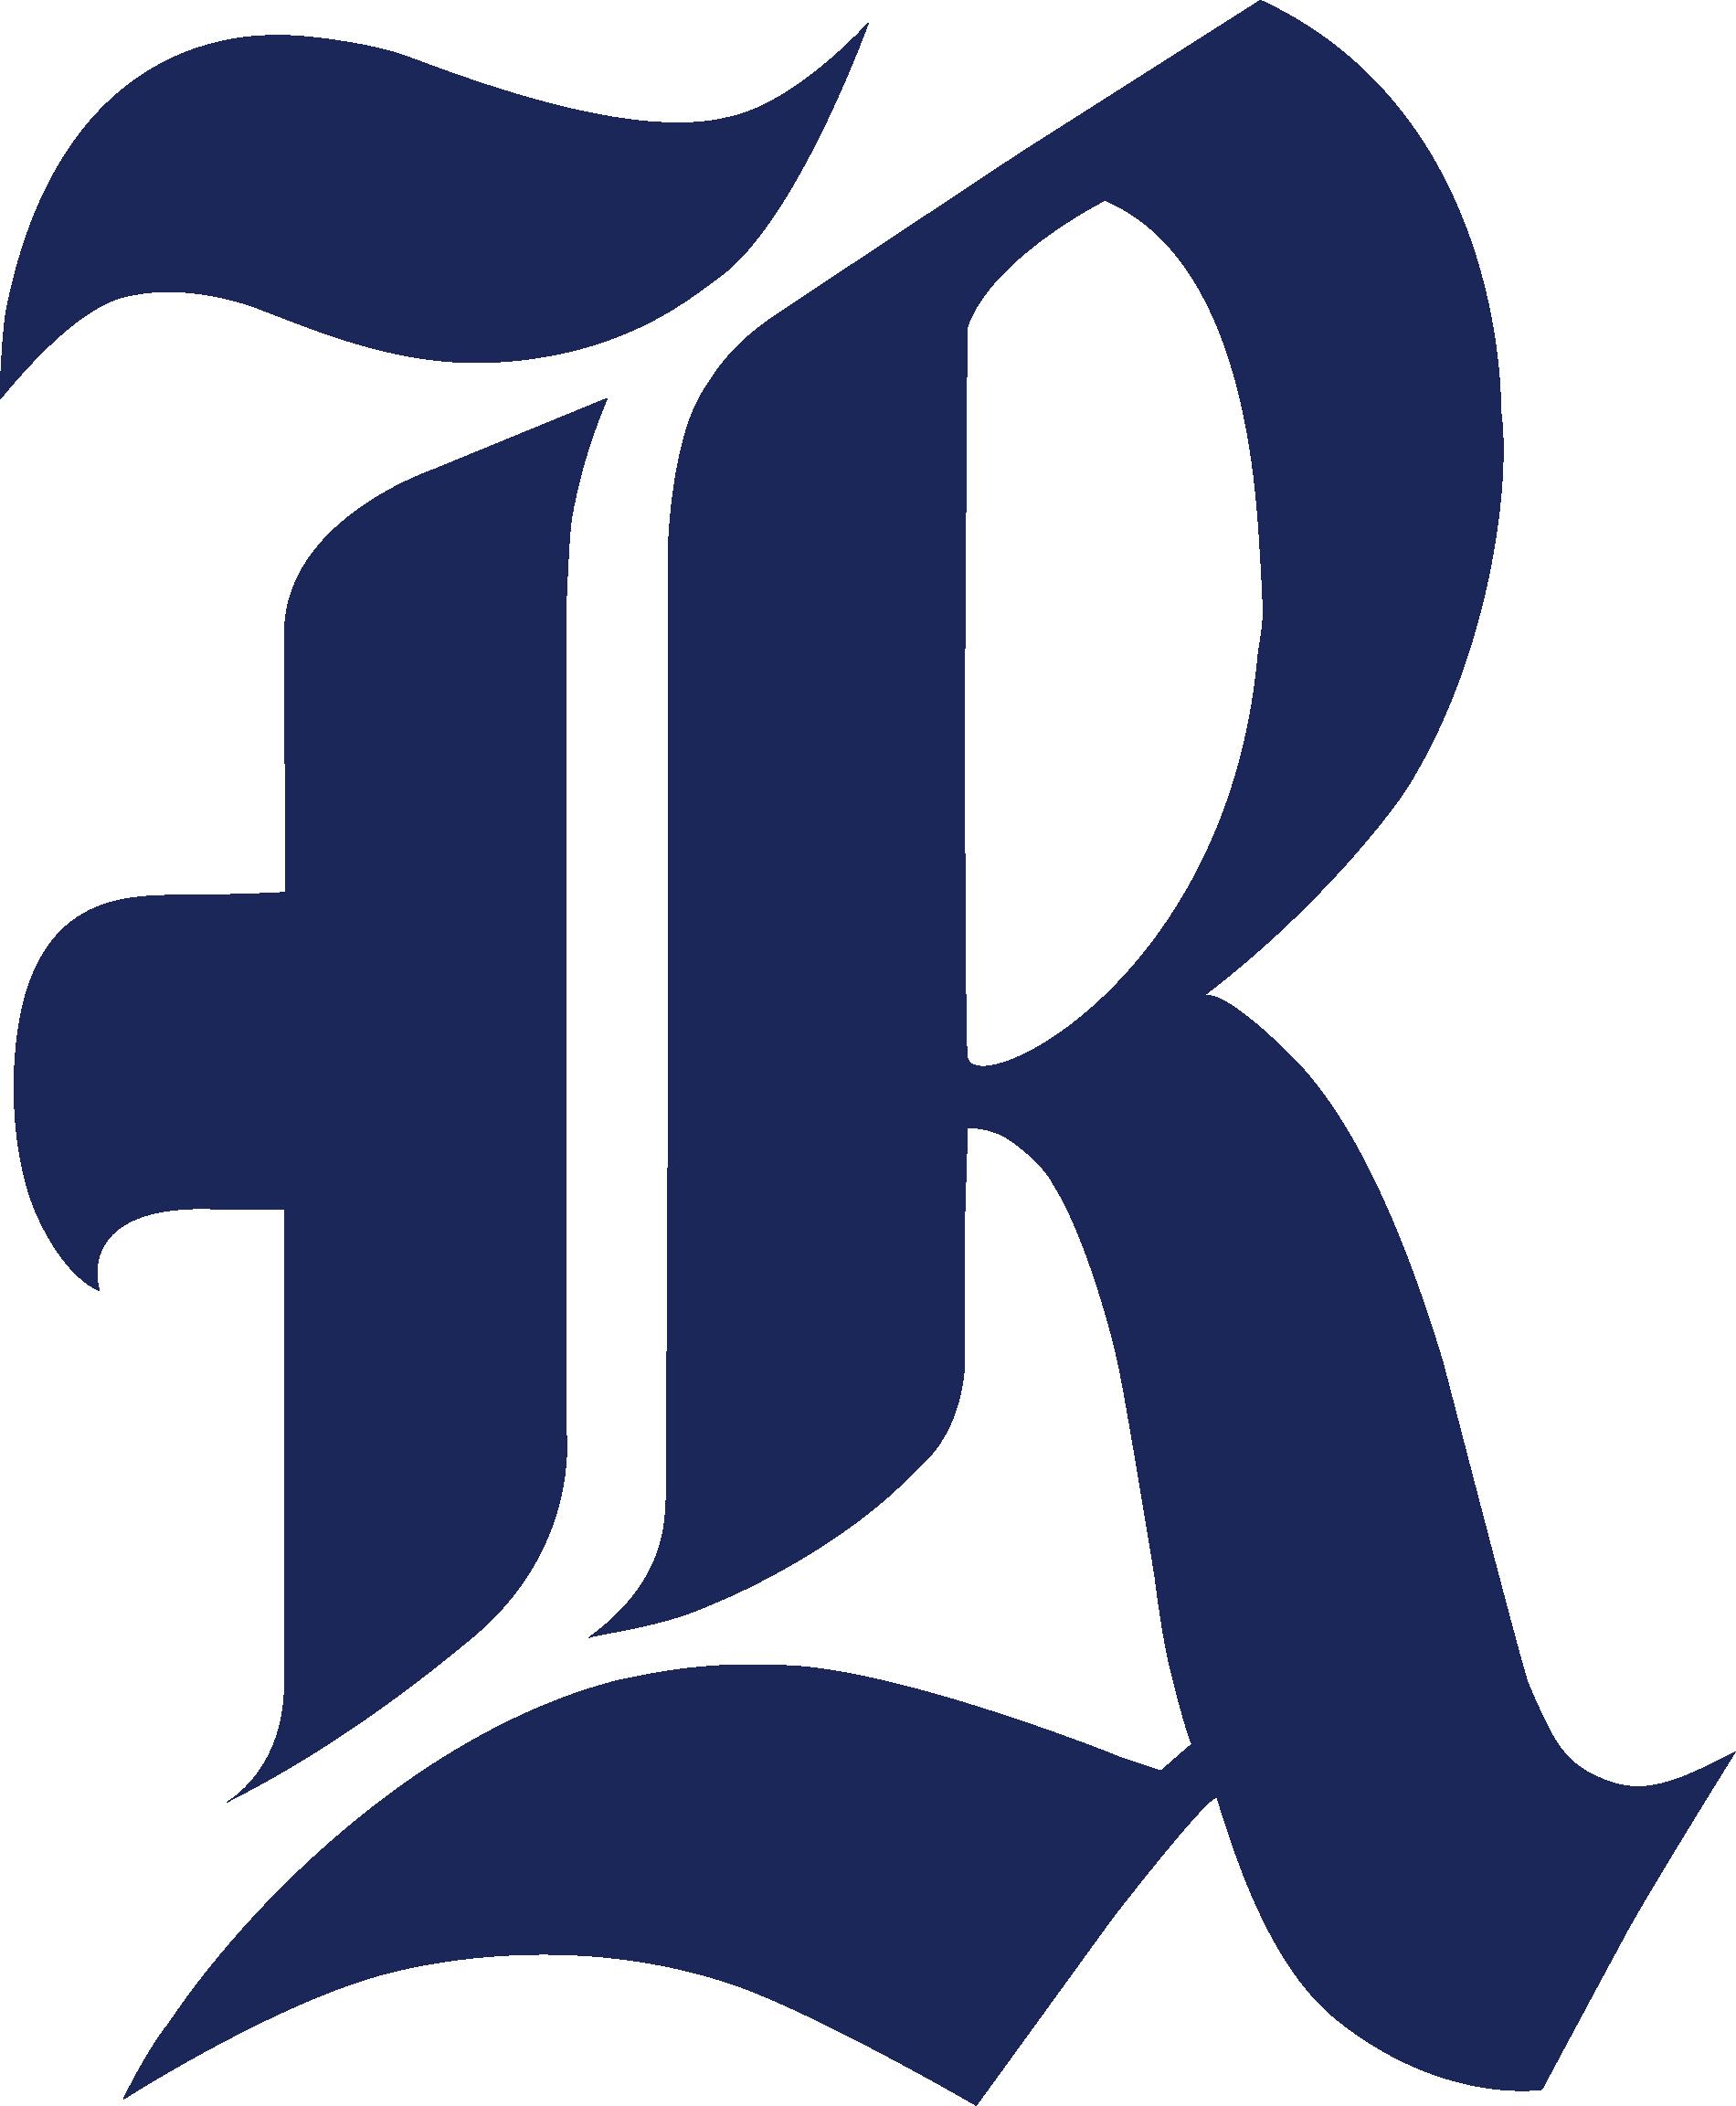 Lsu baseball clipart image transparent library 2017 NCAA Baseball Baton Rouge Regional - LSUsports.net - The ... image transparent library